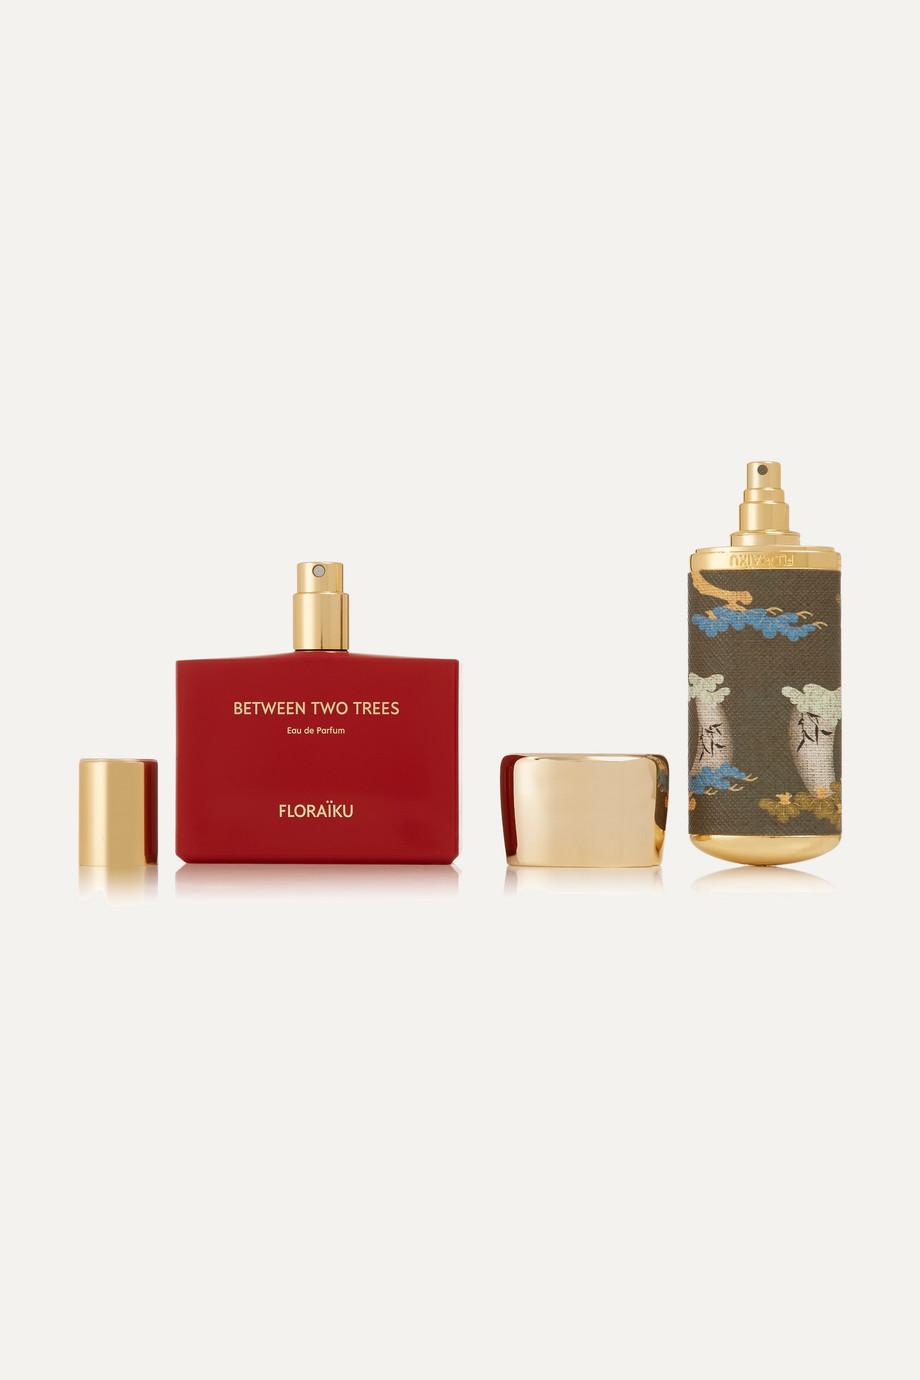 Floraiku Between Two Trees, 50 ml & 10 ml – Eau de Parfum